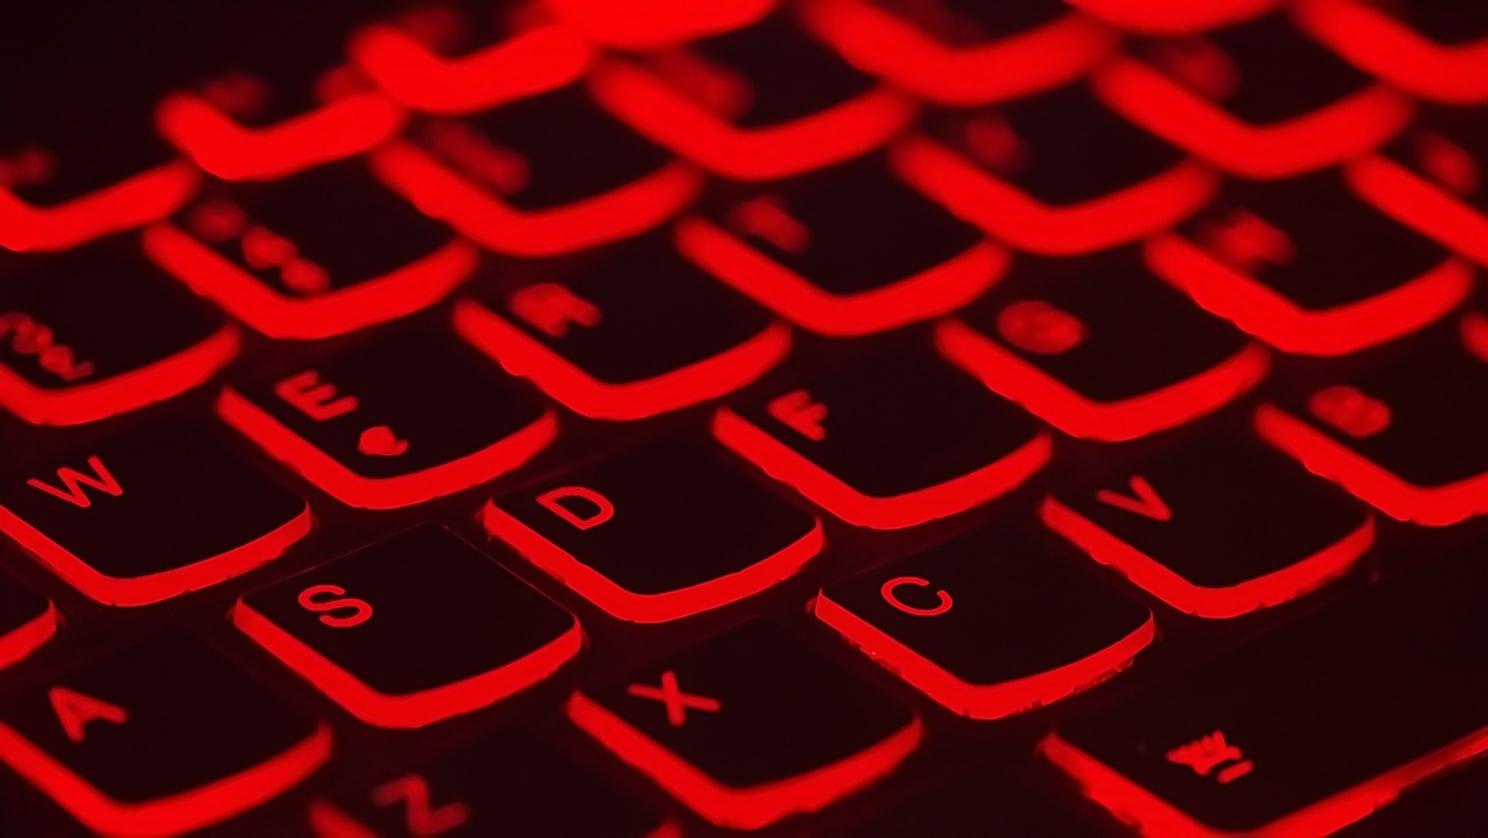 red-keypad